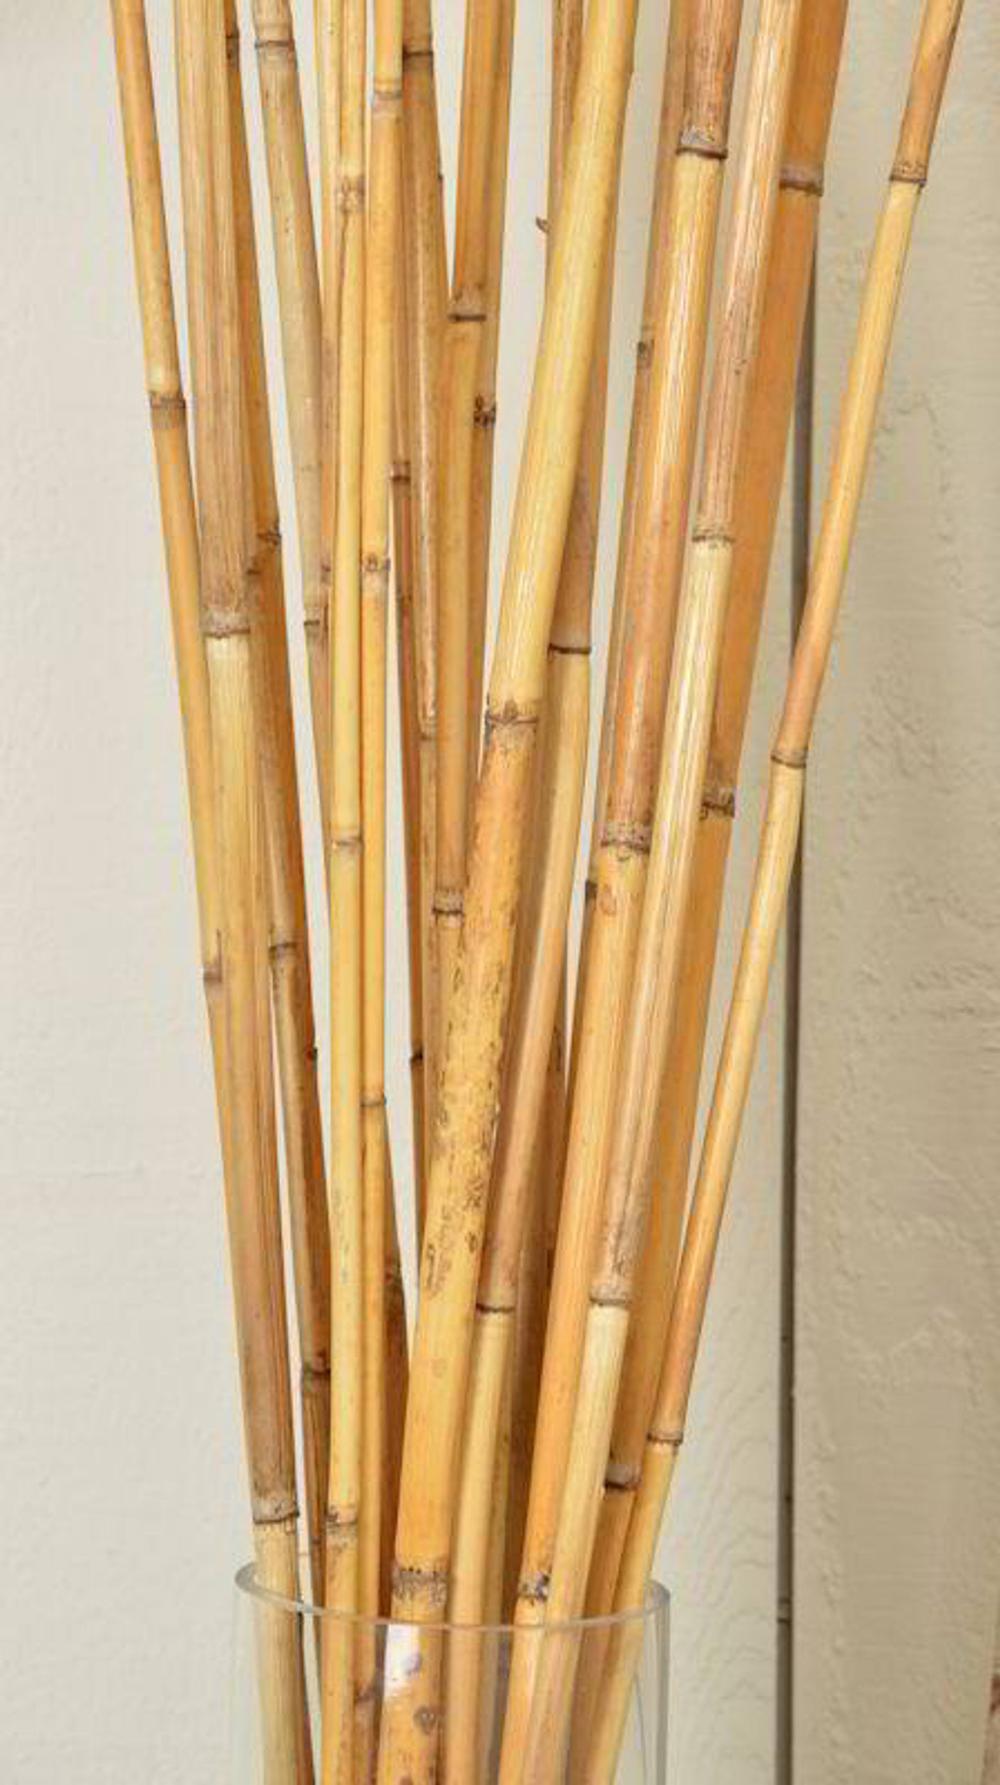 River Cane Bamboo Dried Bamboo Decorative Bamboo Dried Etsy Bamboo Sticks Decor Bamboo Decor Bamboo Diy